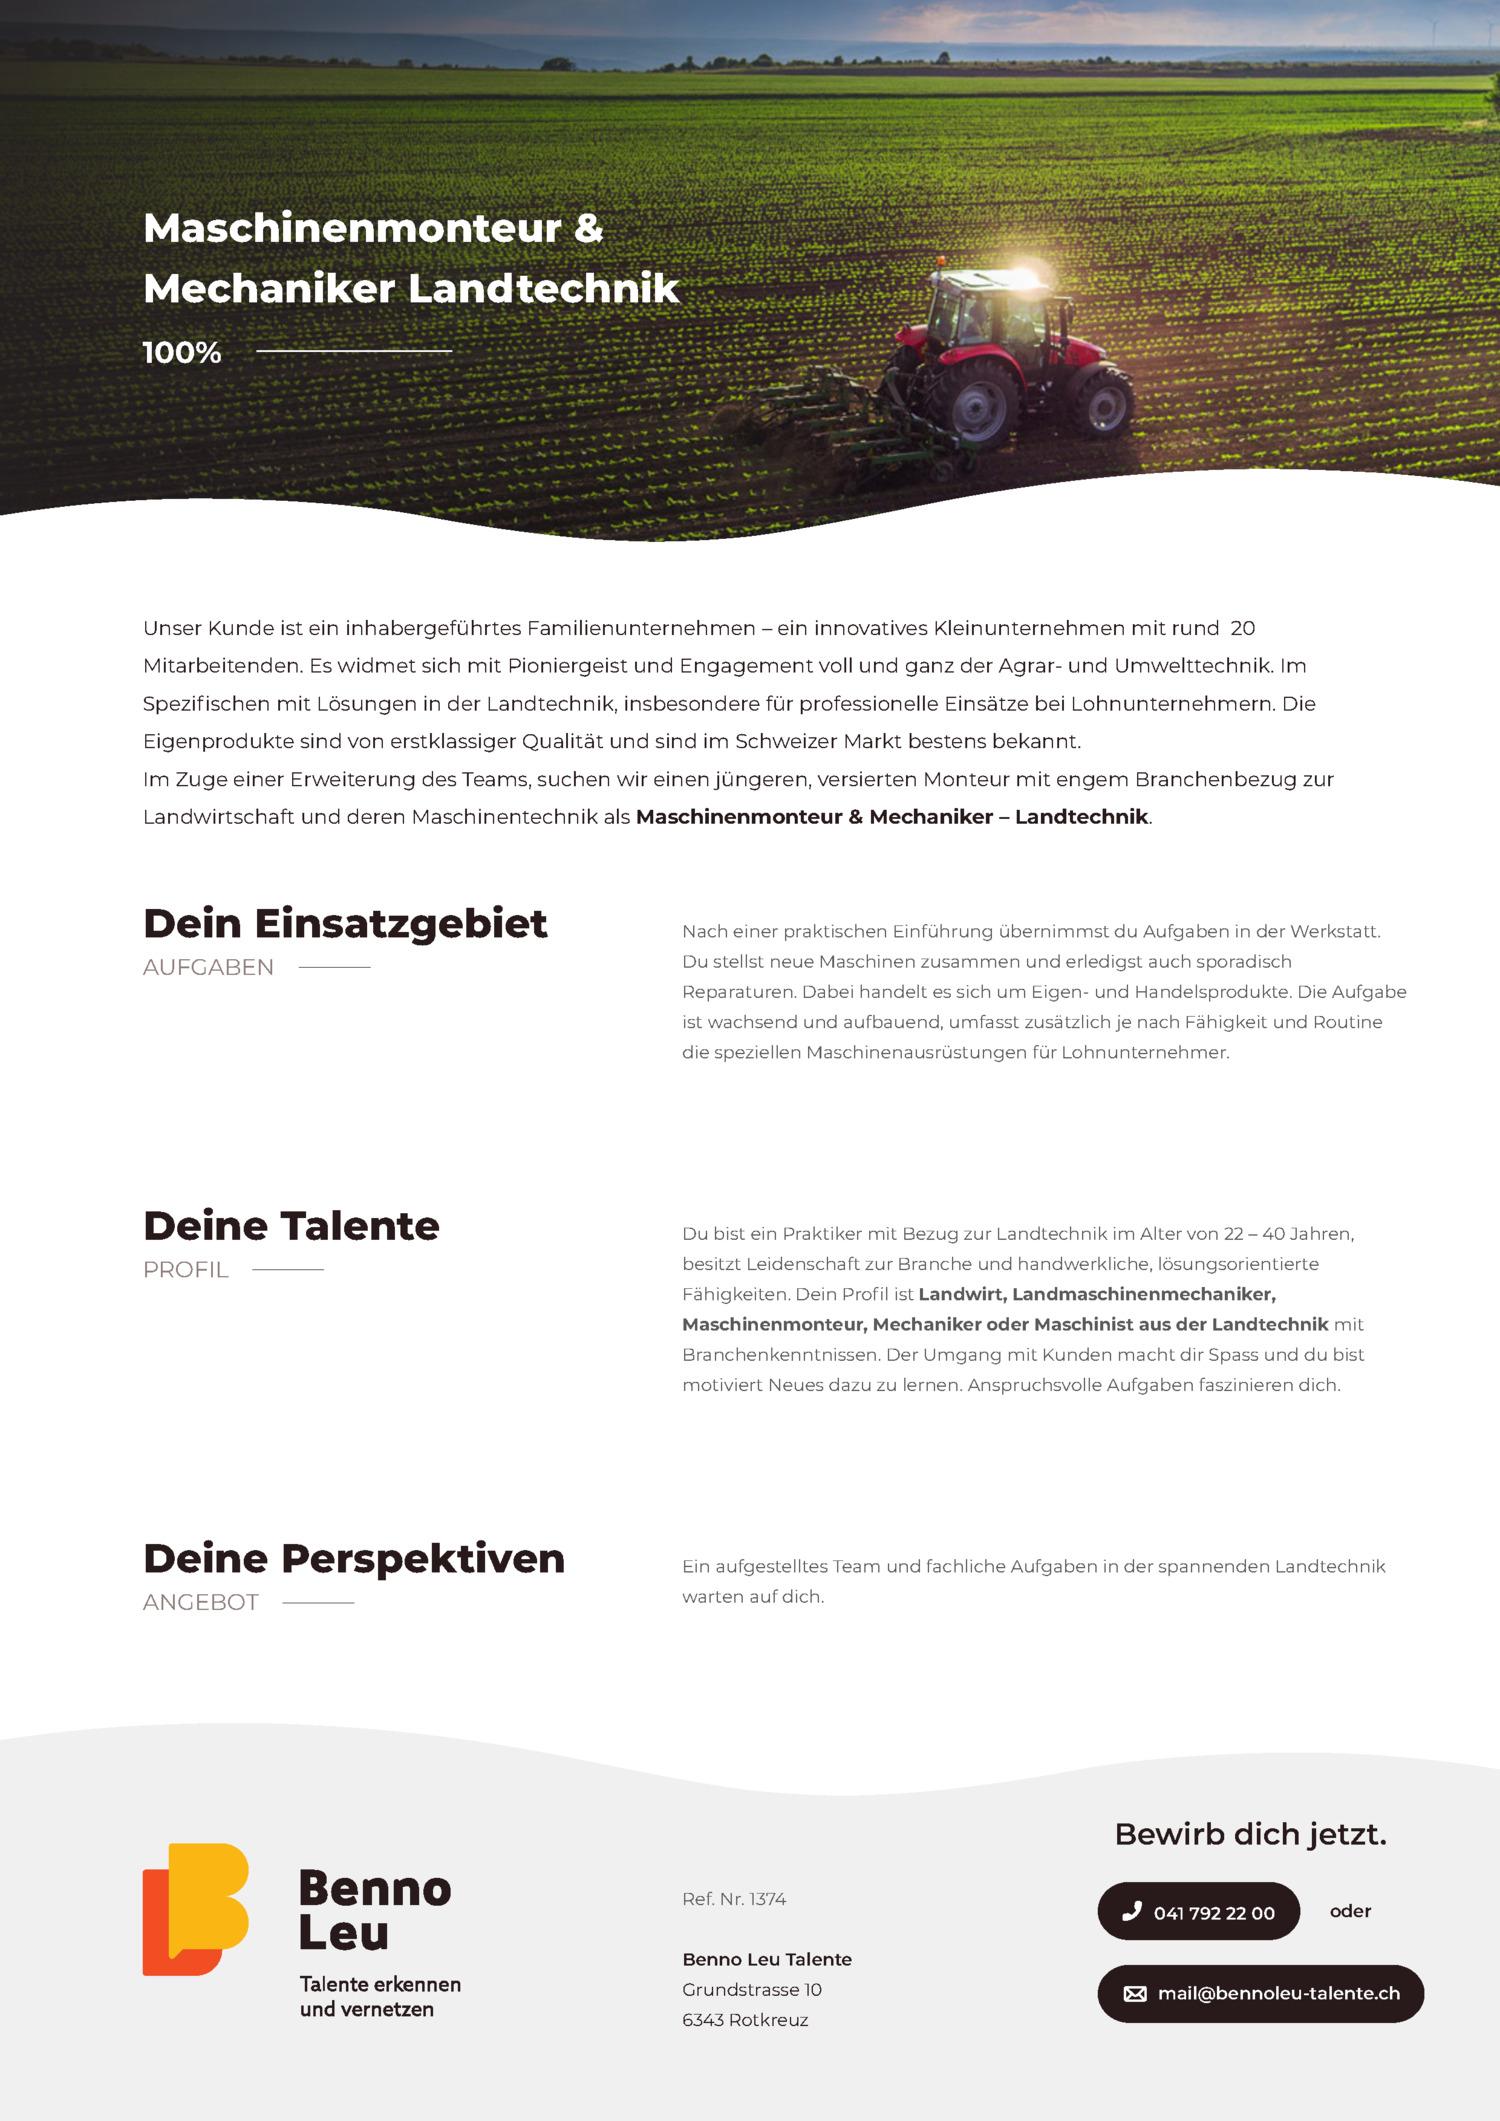 Inserat Maschinenmonteur & Mechaniker Landtechnik